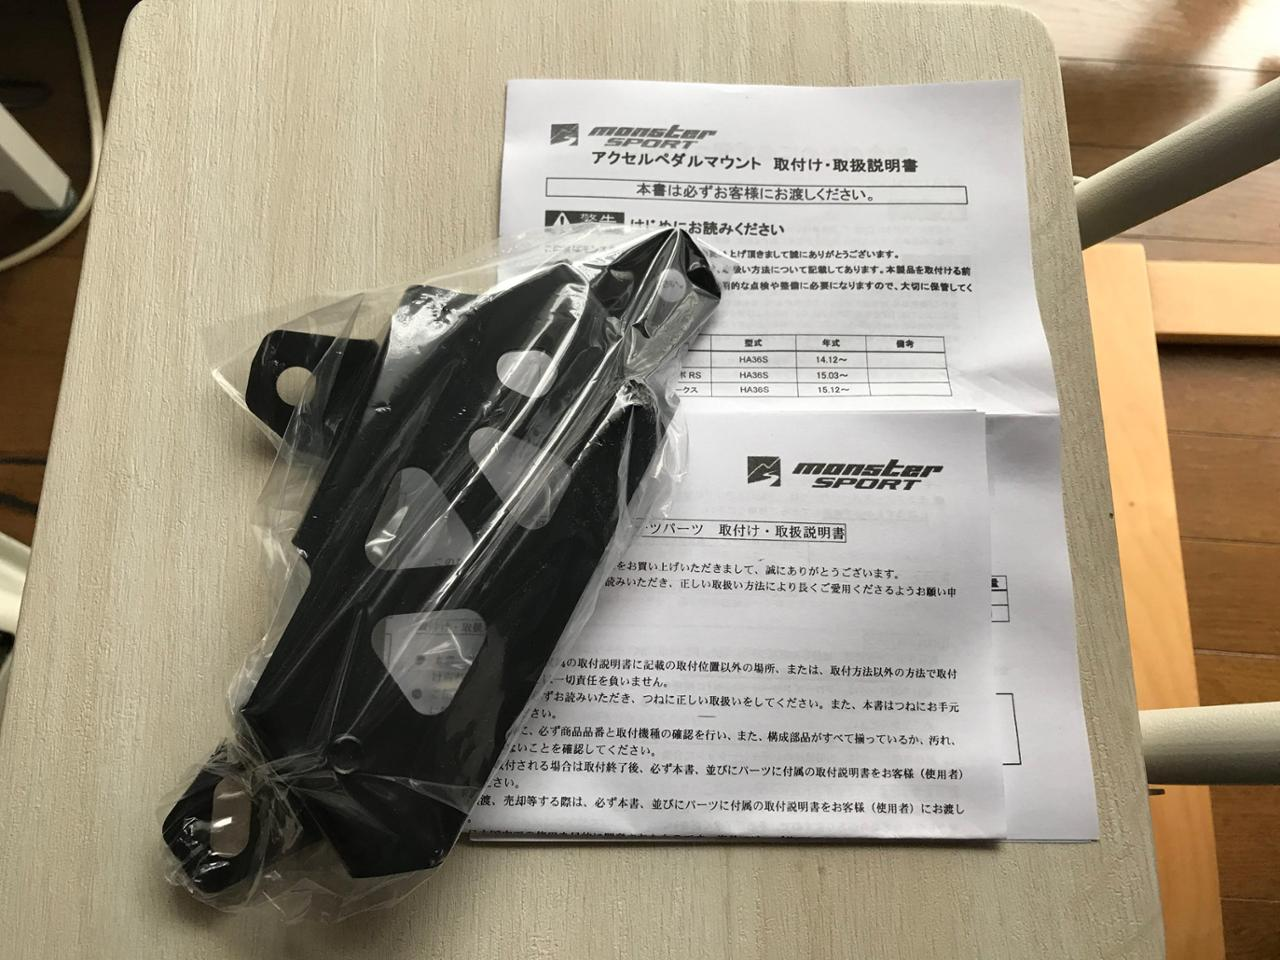 MONSTER SPORT / TAJIMA MOTOR CORPORATION スポーツドライビングアクセルペダルマウント